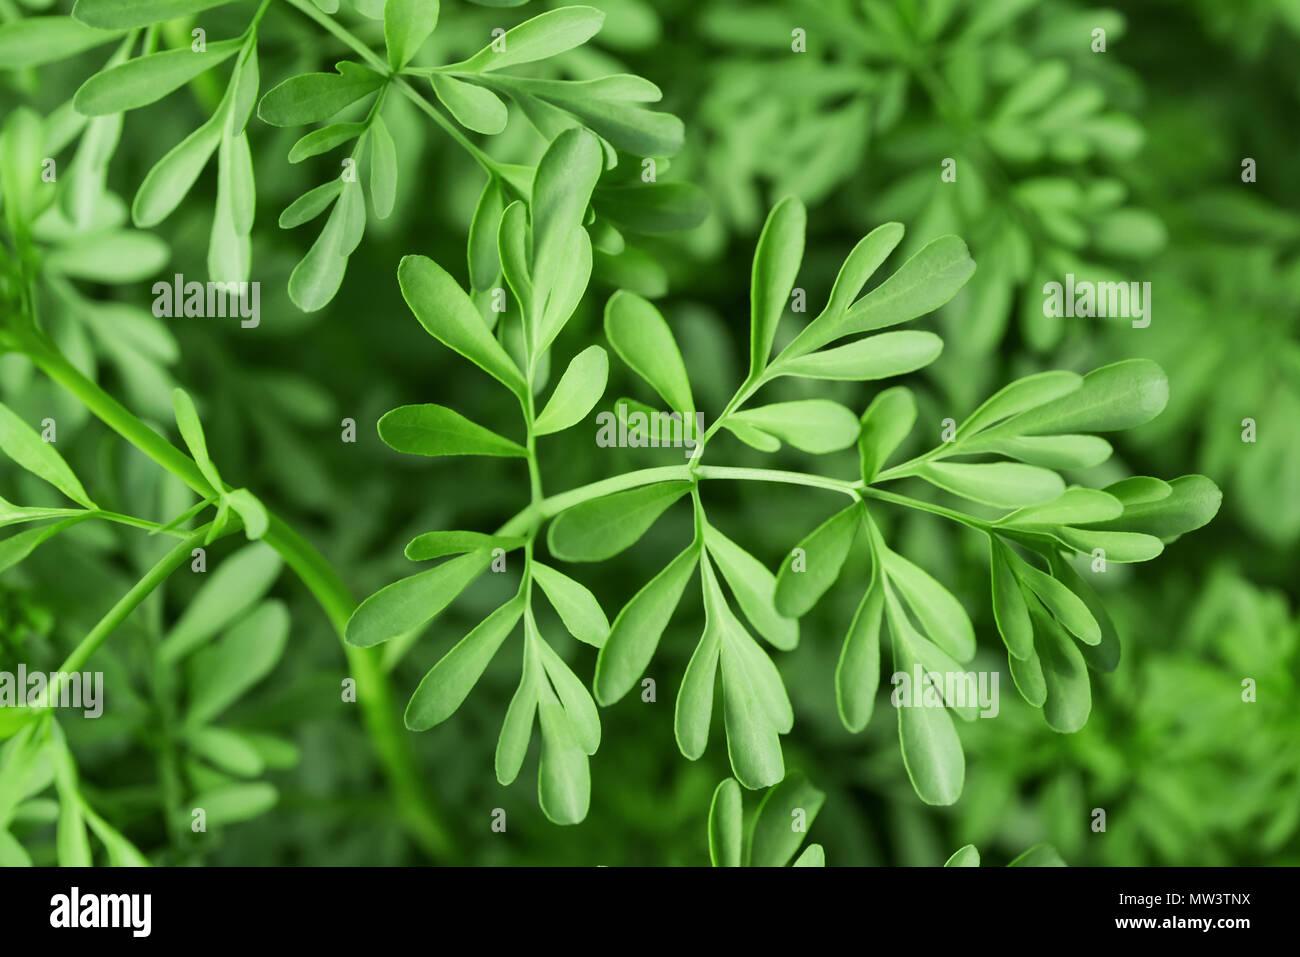 Green Herb of Grace (Ruta graveolens) plant - Stock Image